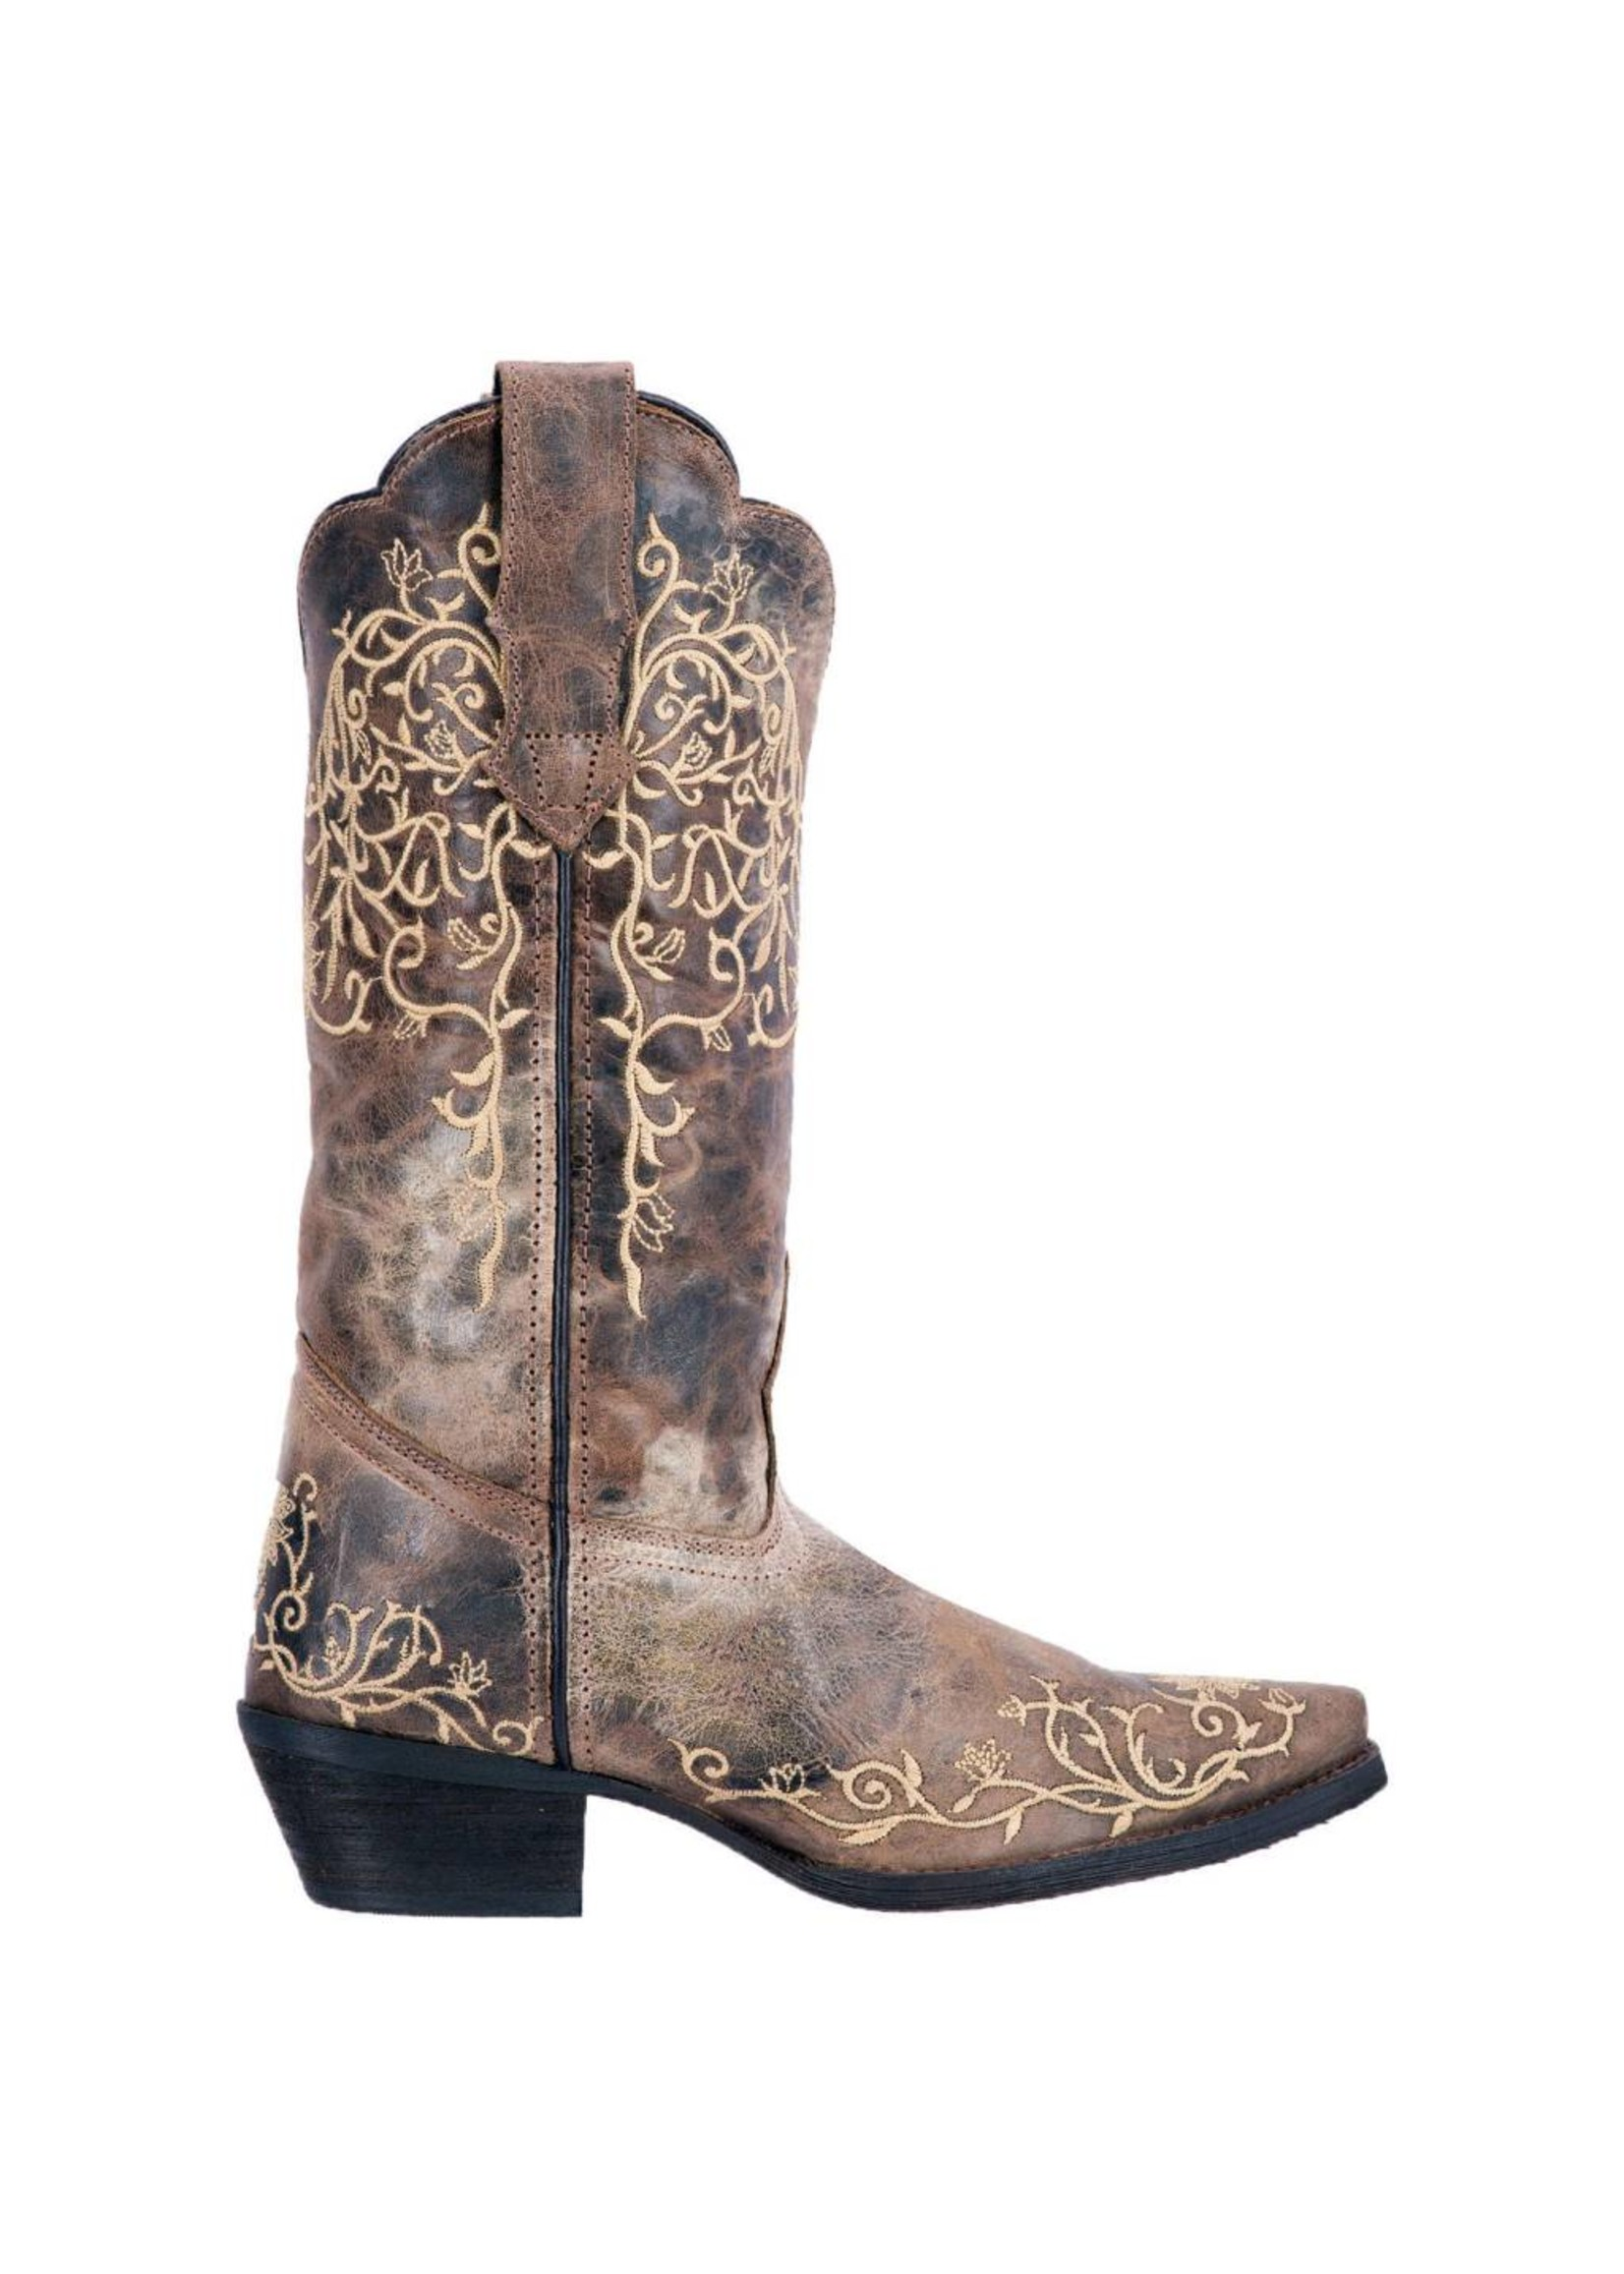 Laredo Laredo Women's Jasmine Western Fashion 12 Inch Snip Toe Cowboy Boot 52177